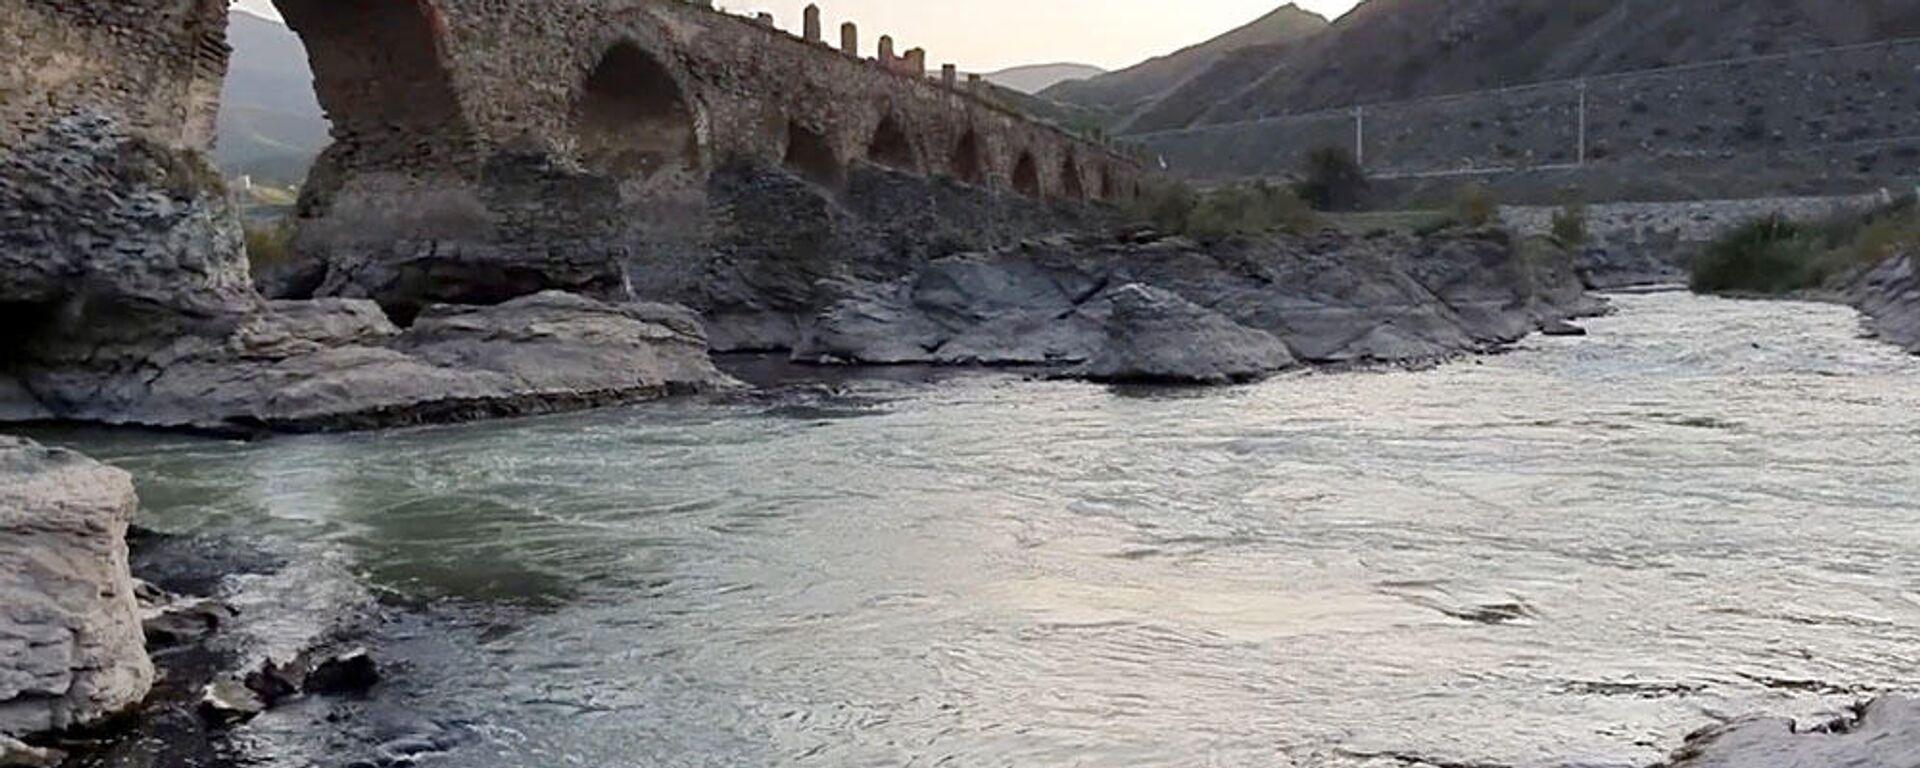 Видео министерства обороны Азербайджана - Sputnik Азербайджан, 1920, 28.09.2021